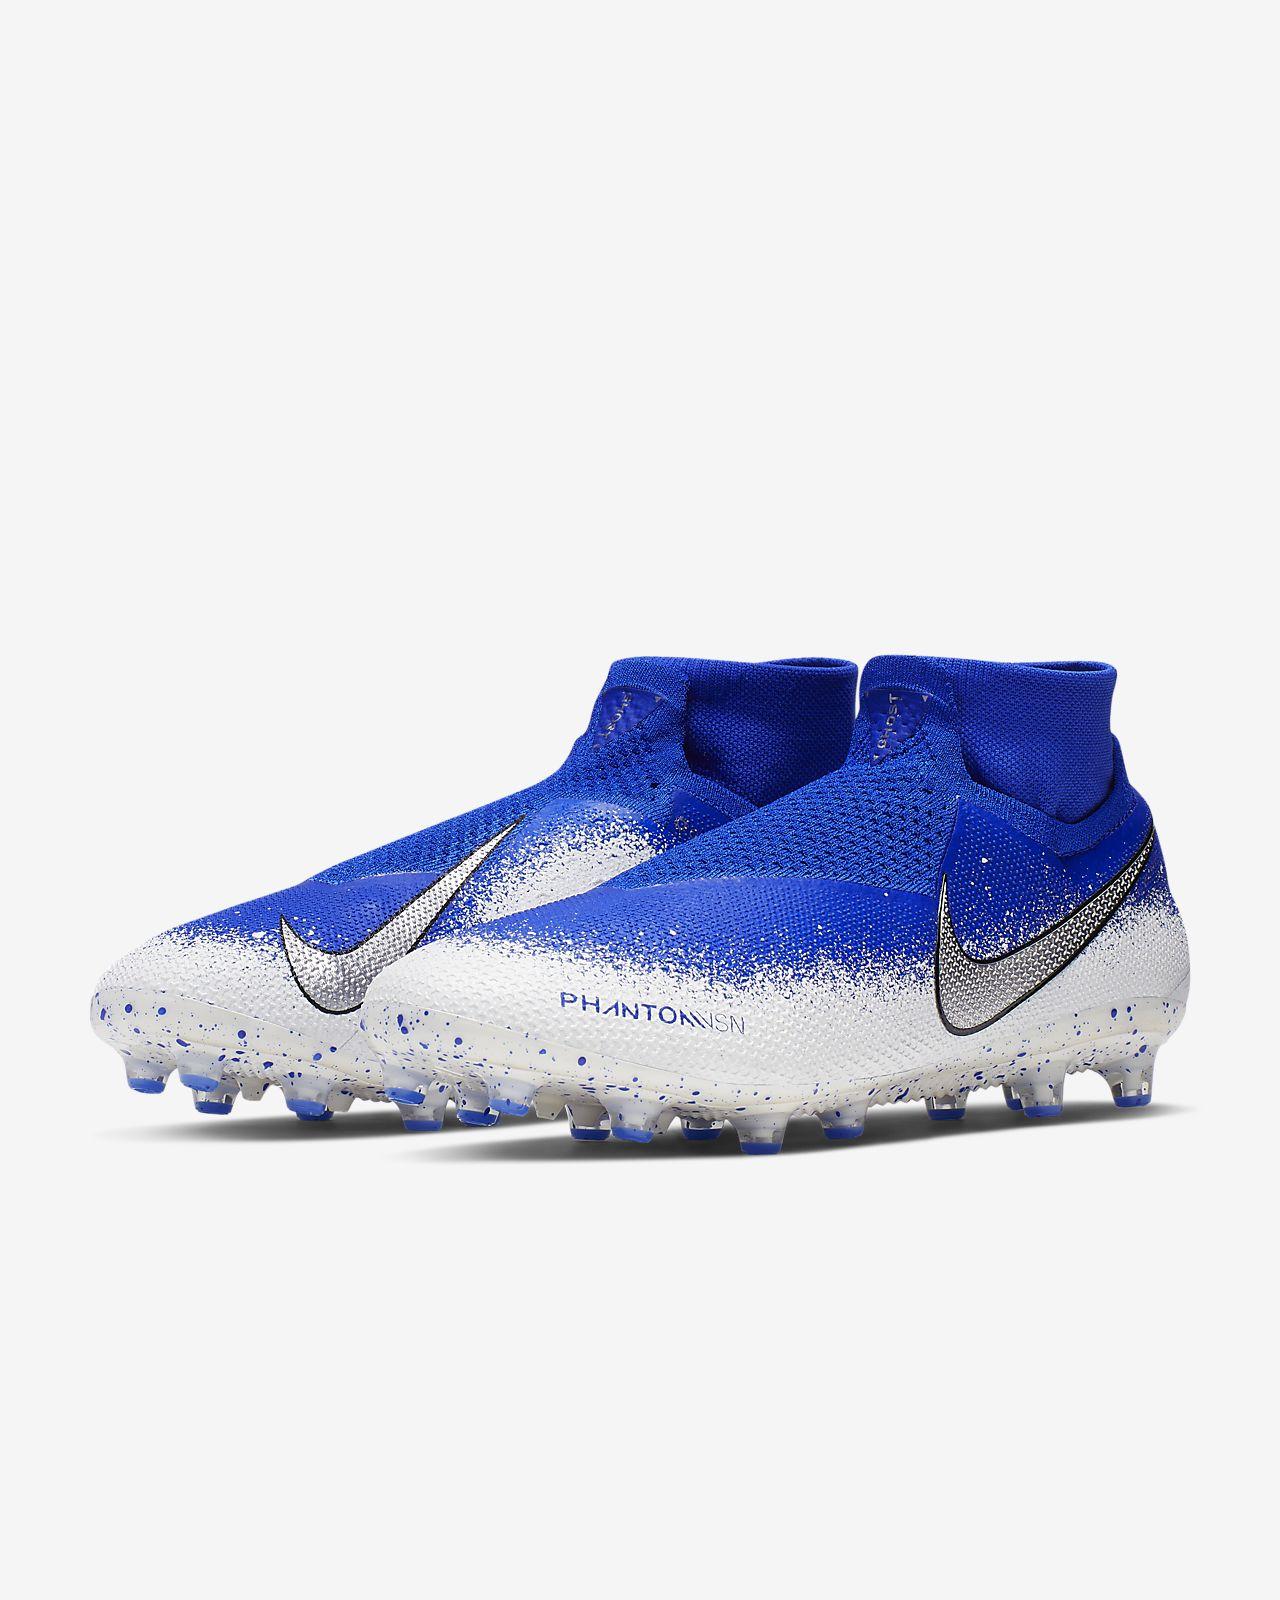 70fefec37a1 Nike Phantom Vision Elite Dynamic Fit Artificial-Grass Football Boot ...